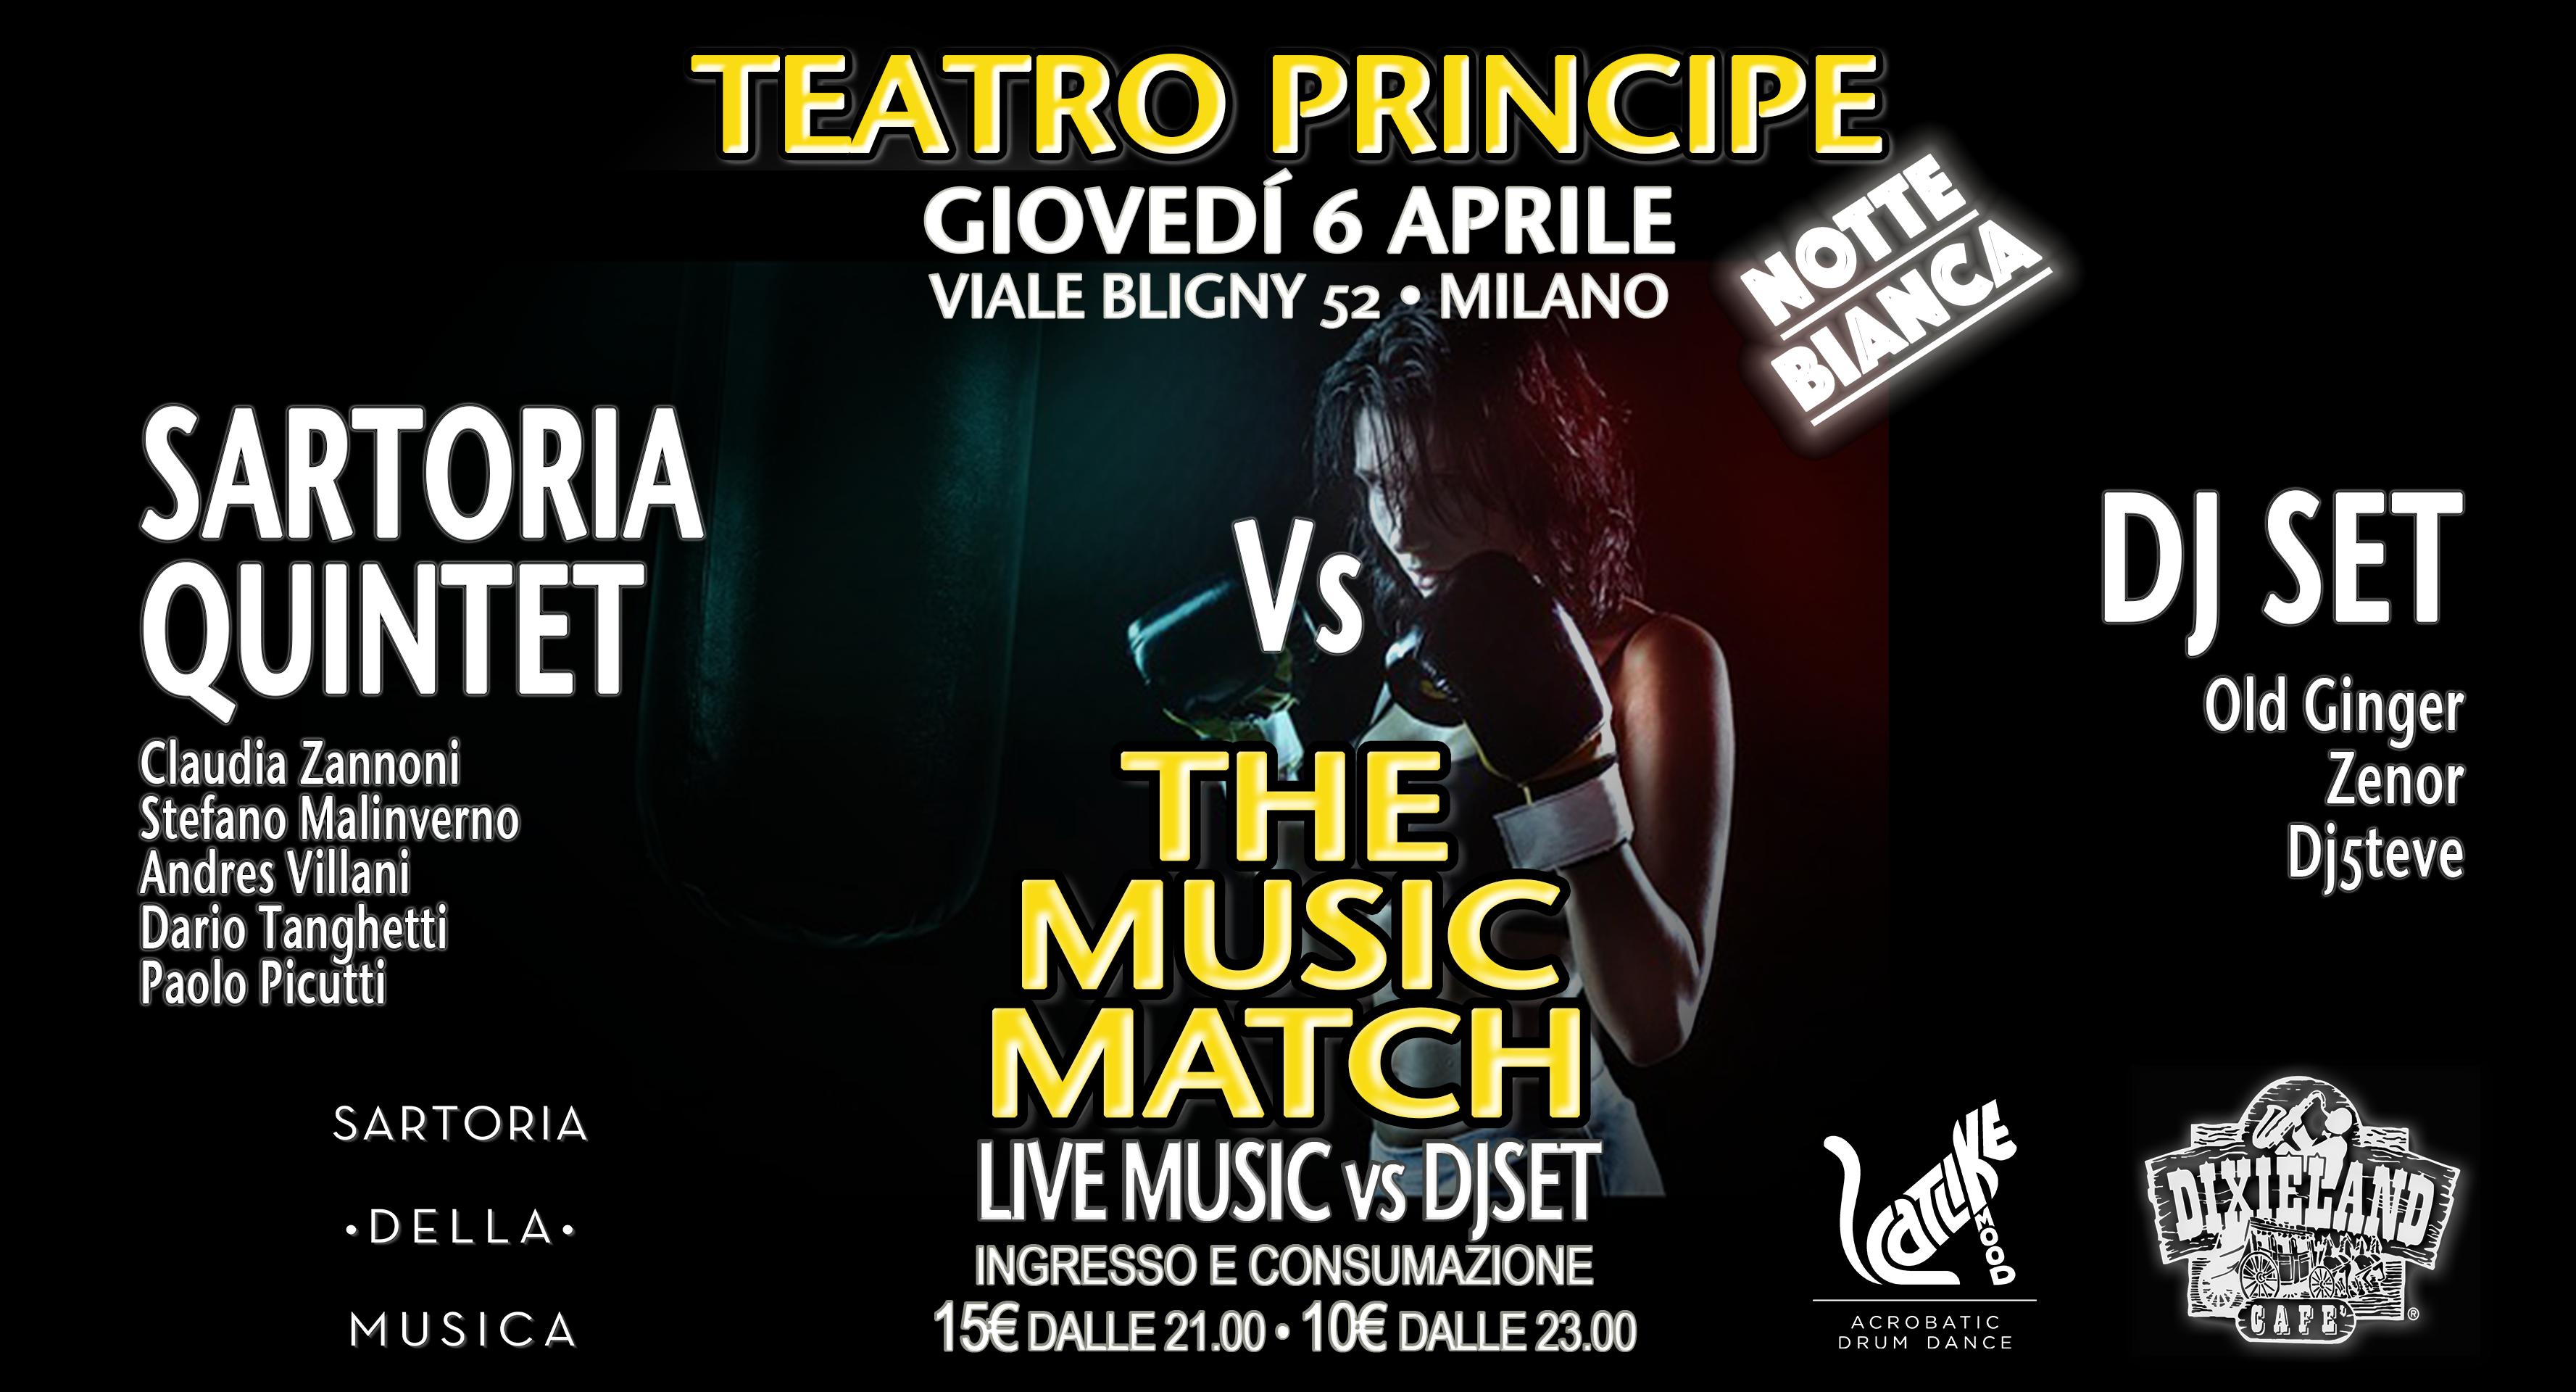 GIOVEDÌ 6 APRILE – THE MUSIC MATCH – LIVE VS DJSET